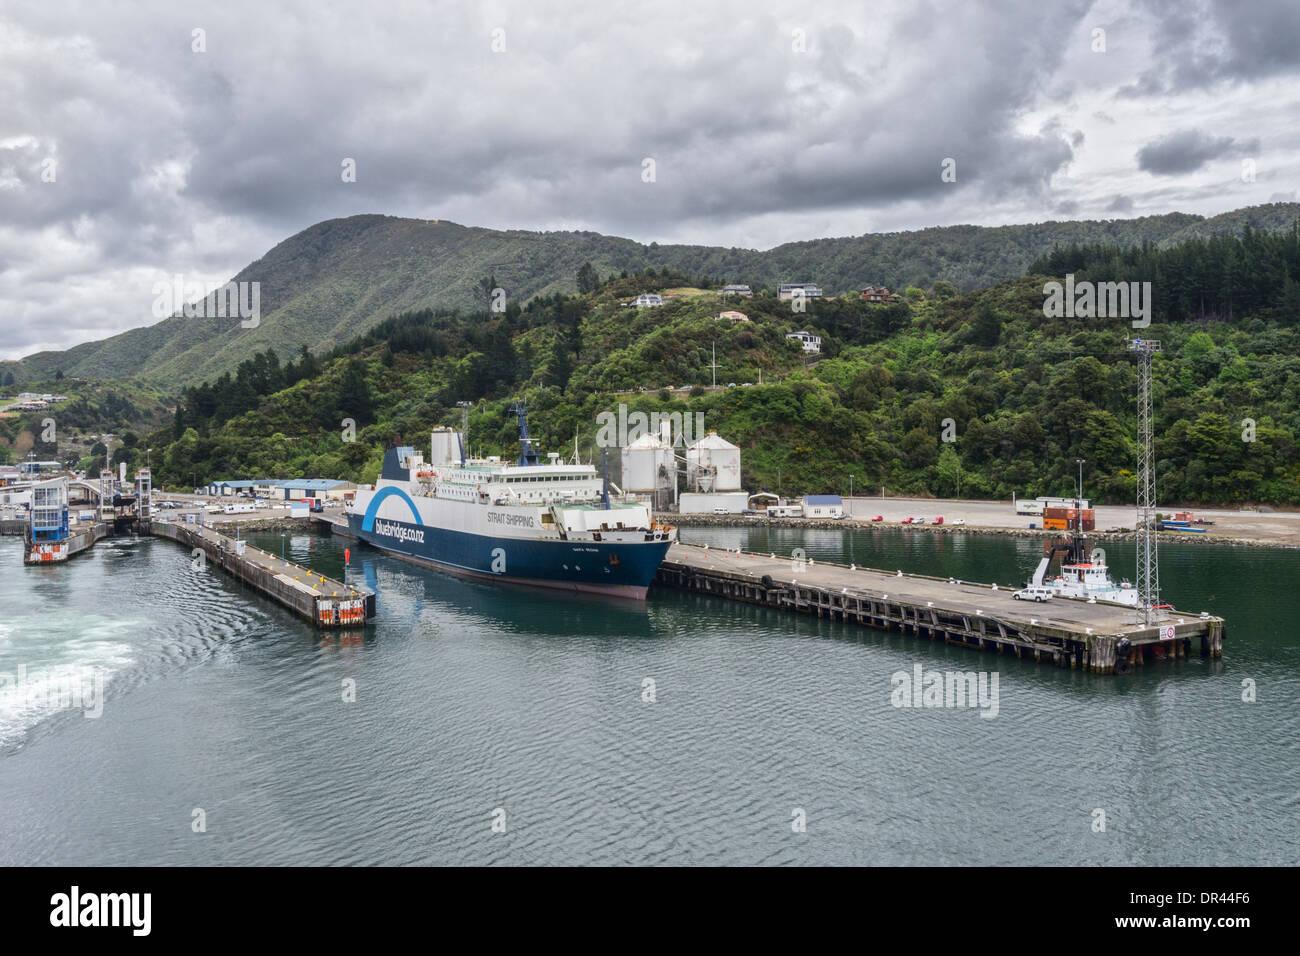 Santa Regina Ferry in port at Picton New Zealand - Stock Image